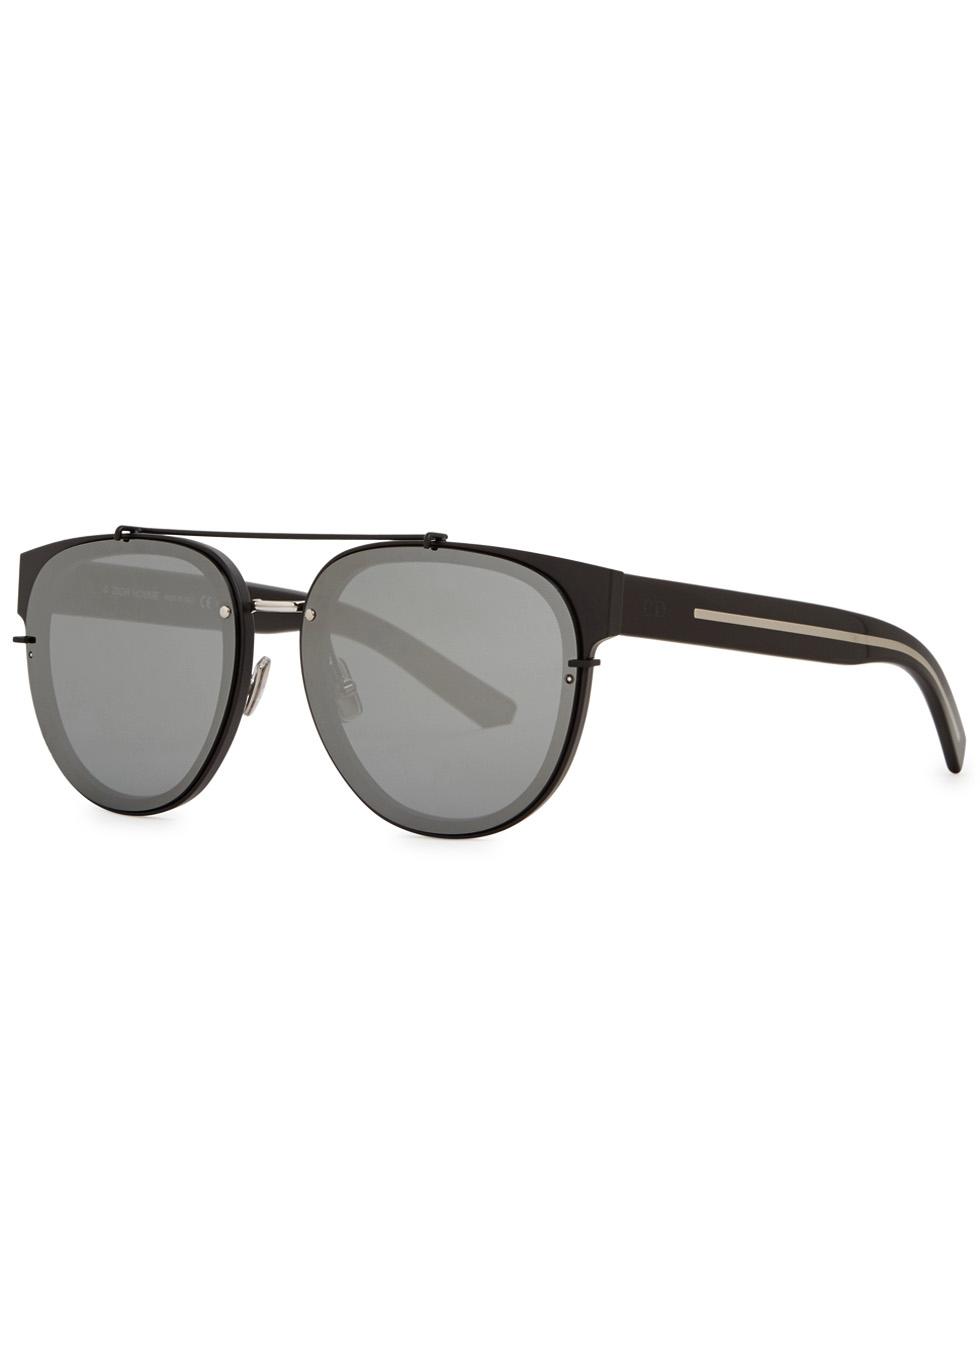 Black Tie 143S matte black aviator-style sunglasses - Dior Homme